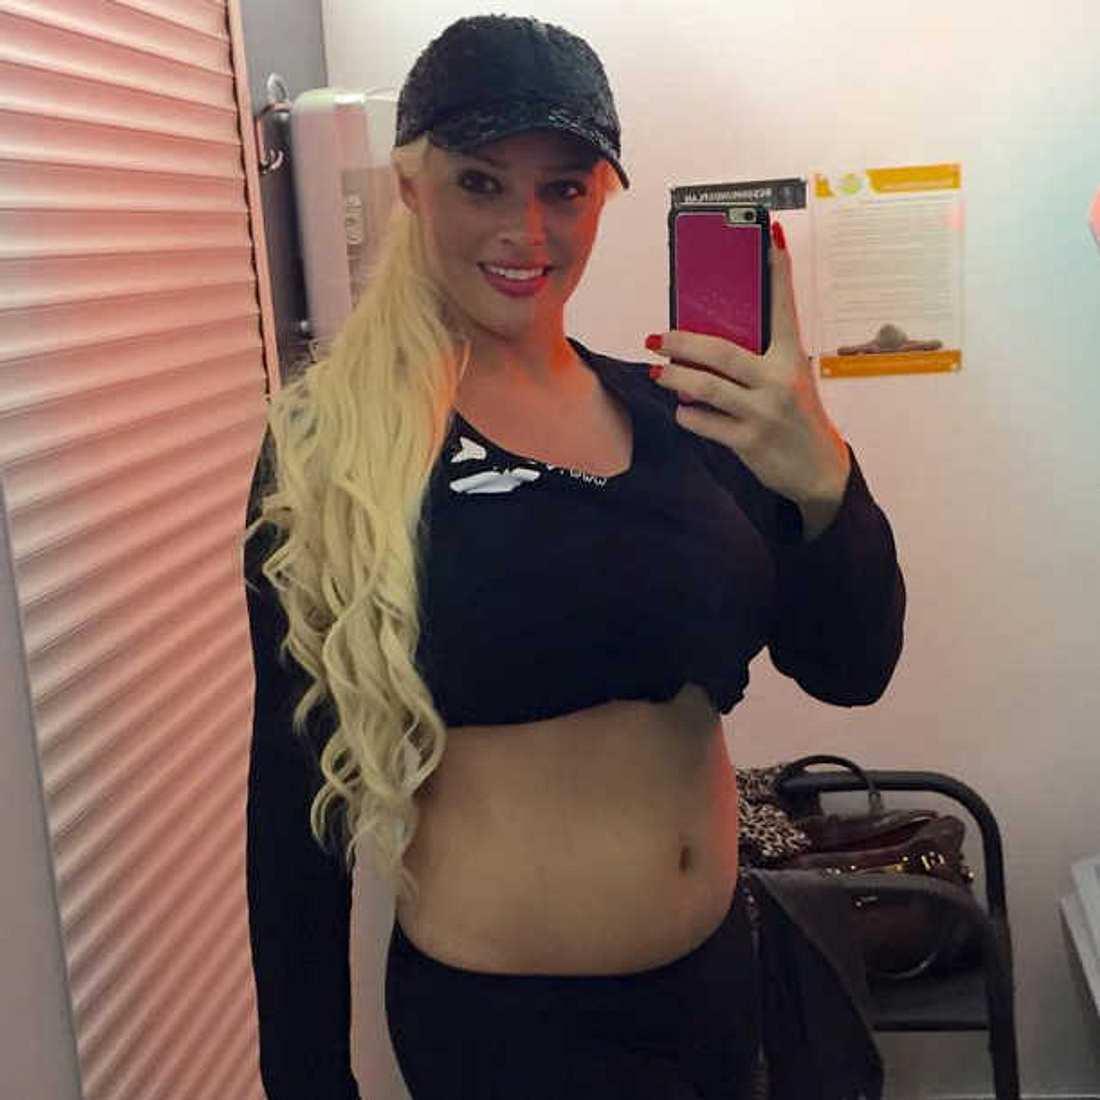 13 Kilos hat Daniela Katzenberger schon abgenommen